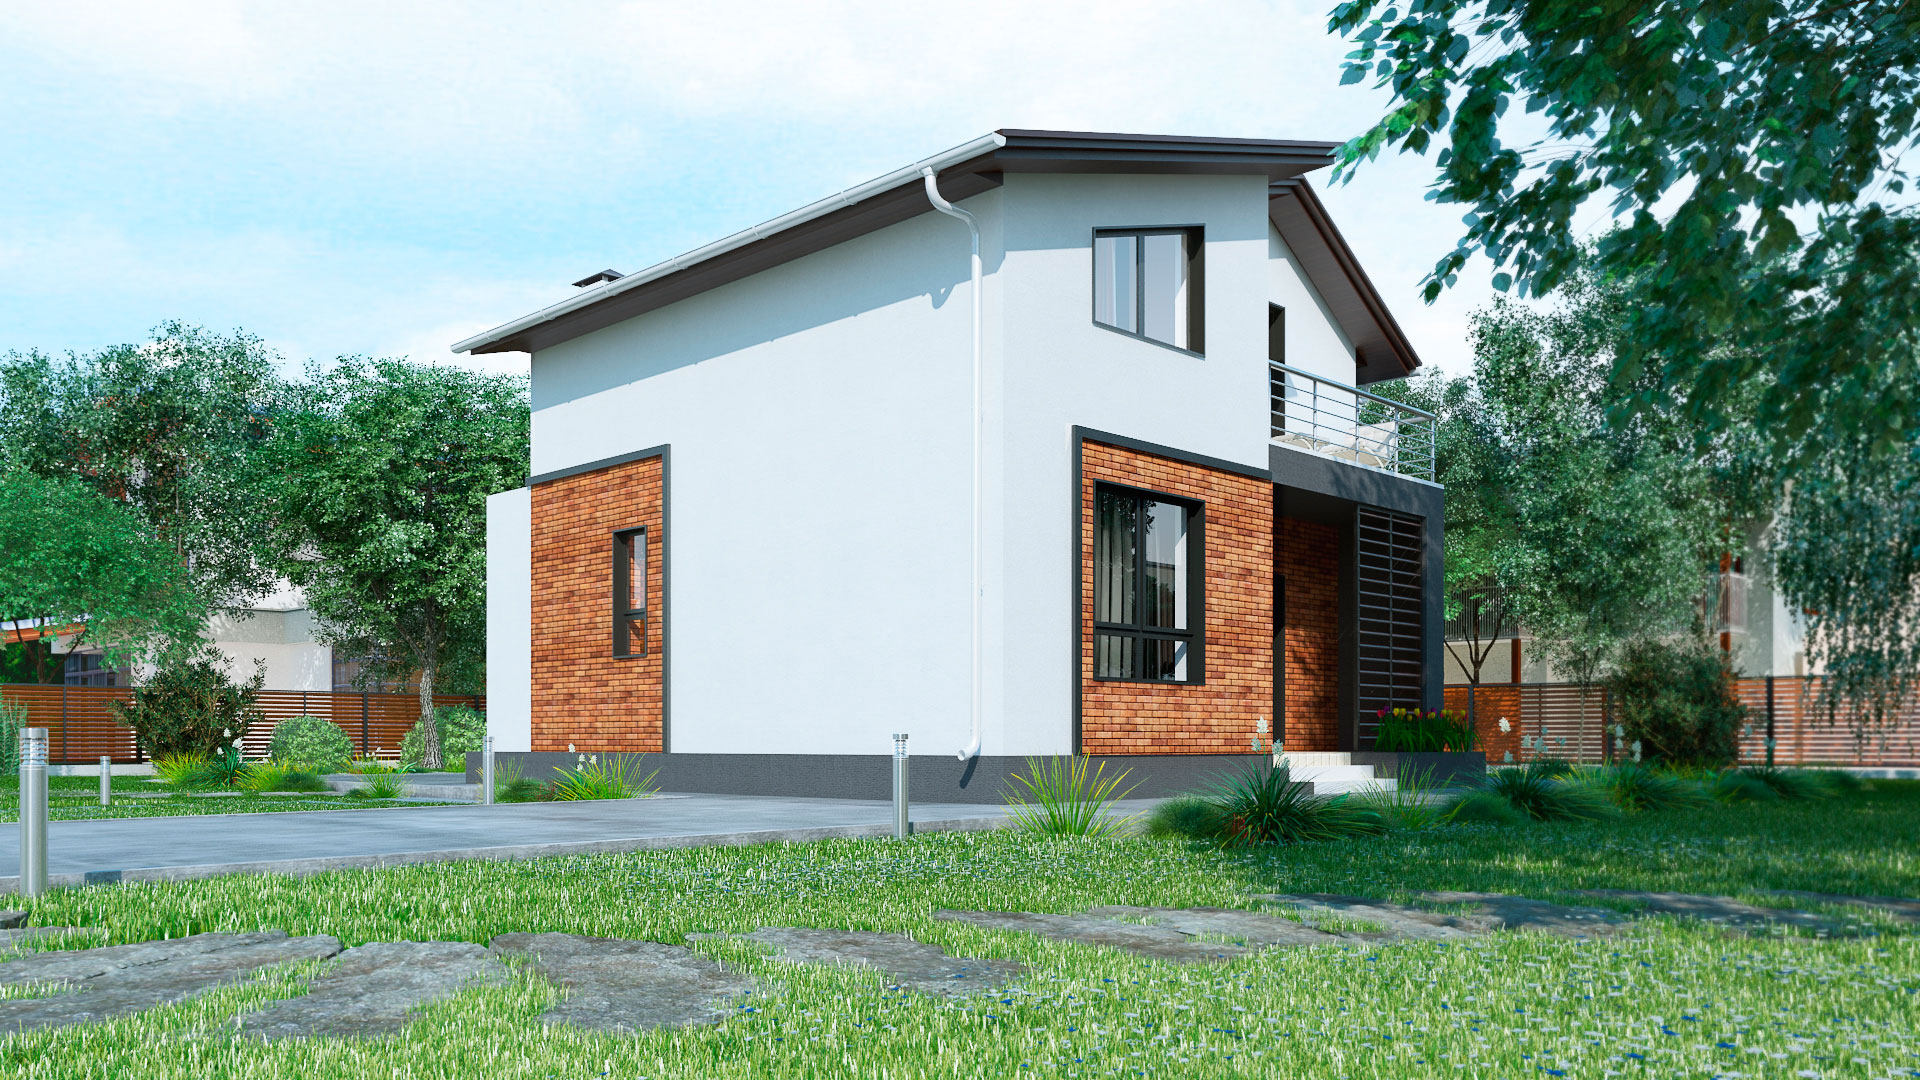 Задний фасад загородного дома 9 на 9 двухэтажного, проект БЭНПАН МС-146 В.